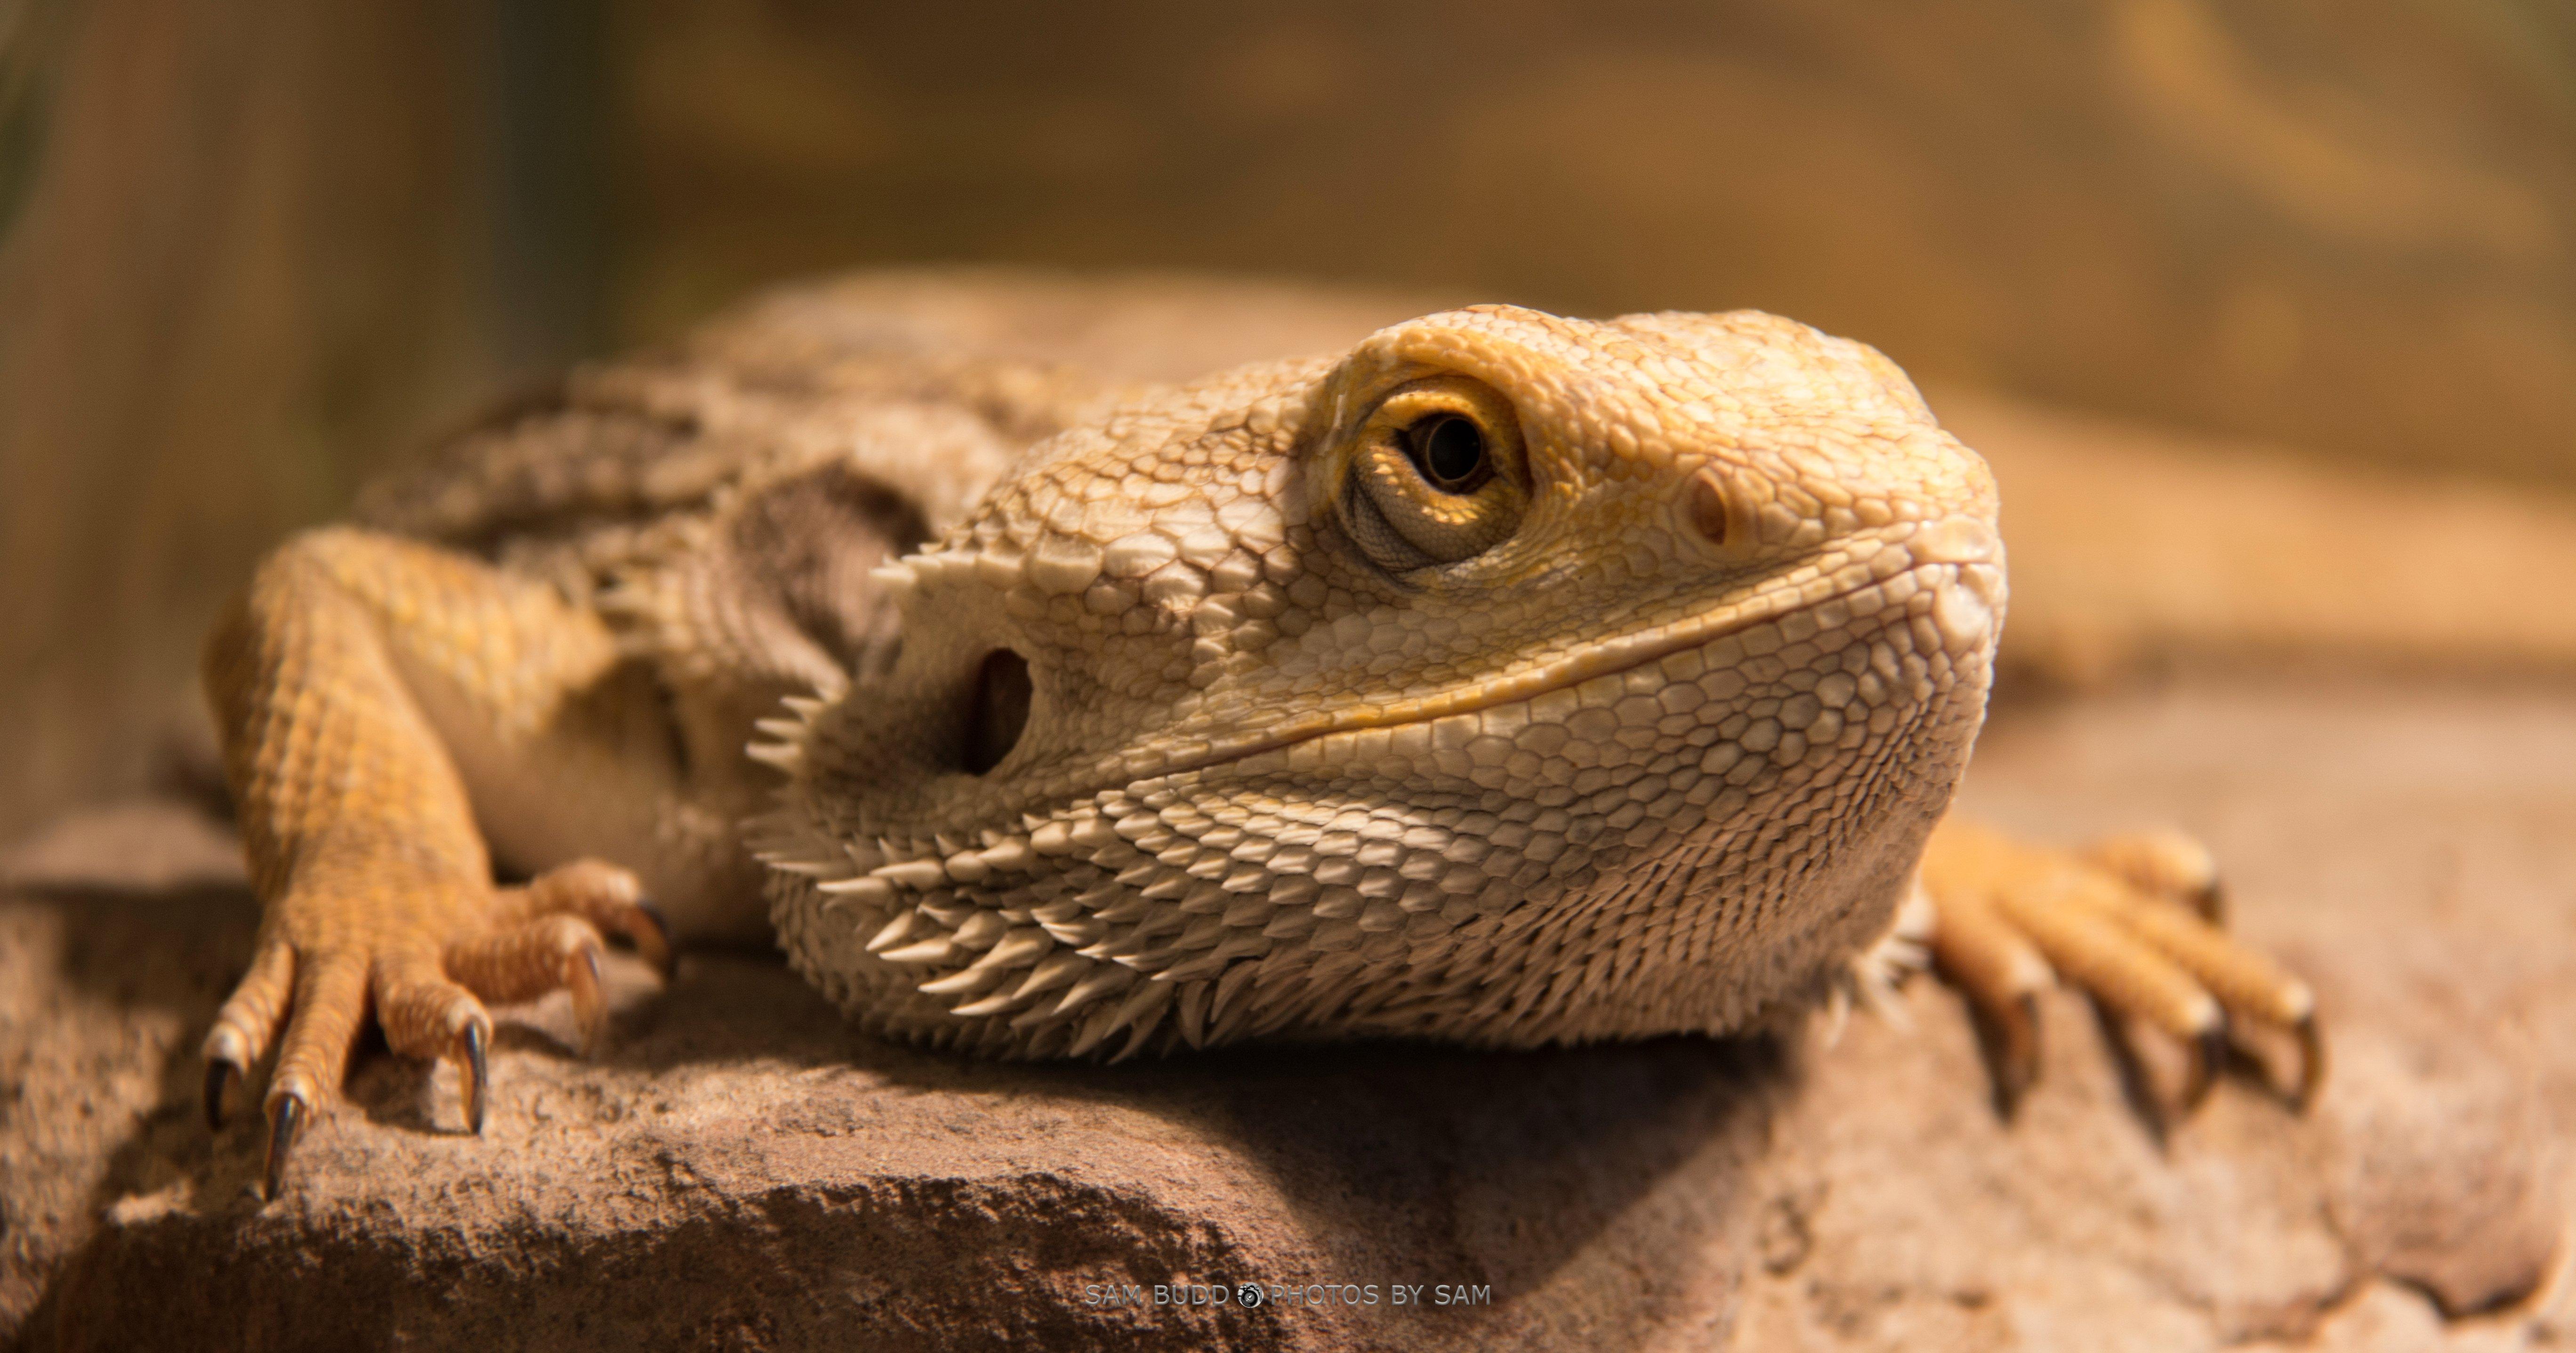 reptile scaled reptile fauna terrestrial animal lizard agama agamidae close up organism iguania komodo dragon macro